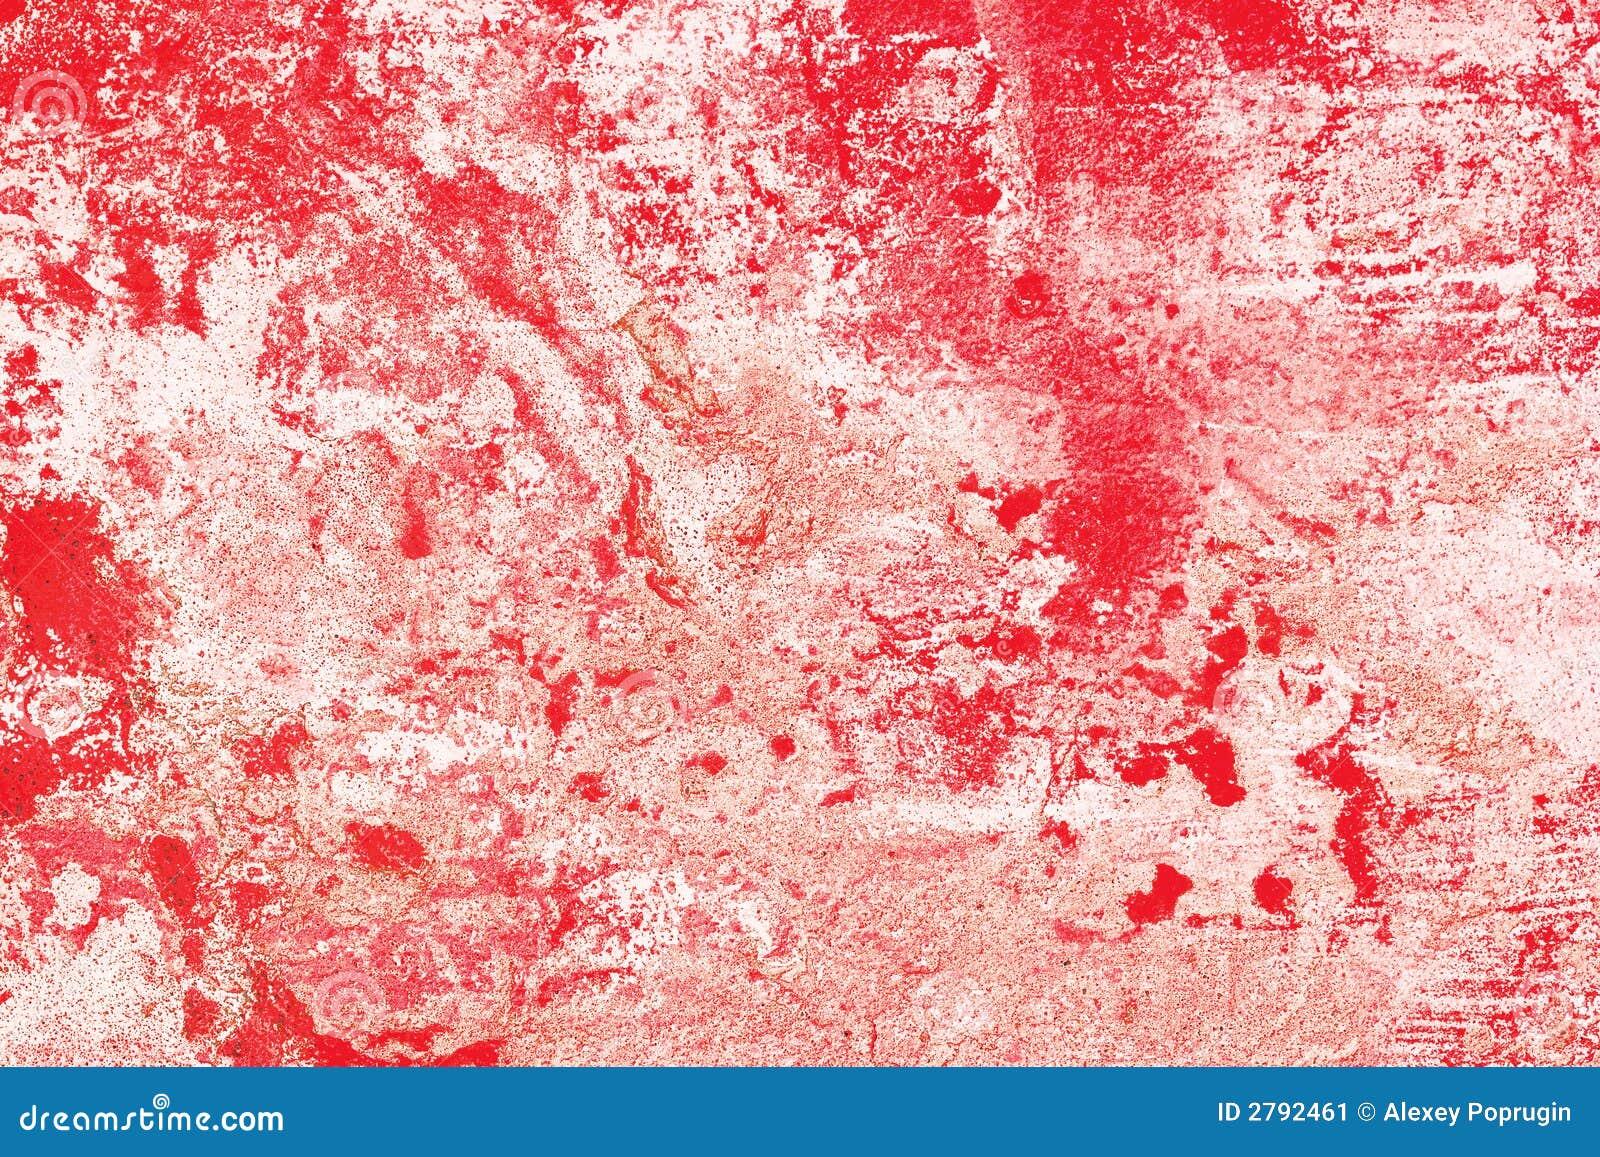 Bloody Grunge Background Stock Image Image Of Awful 2792461